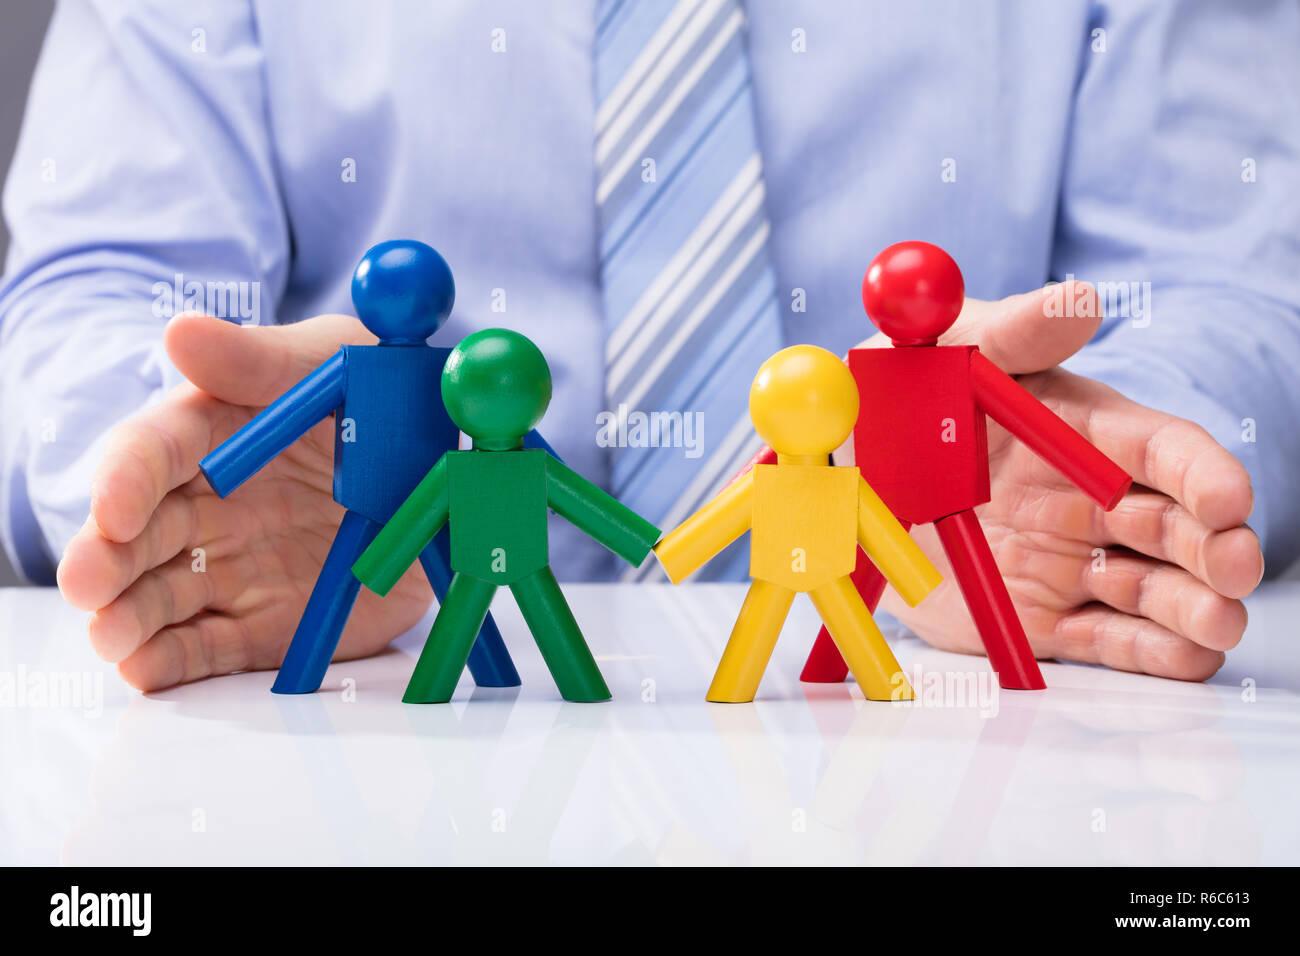 Human Hand Protecting Human Figures Stock Photo